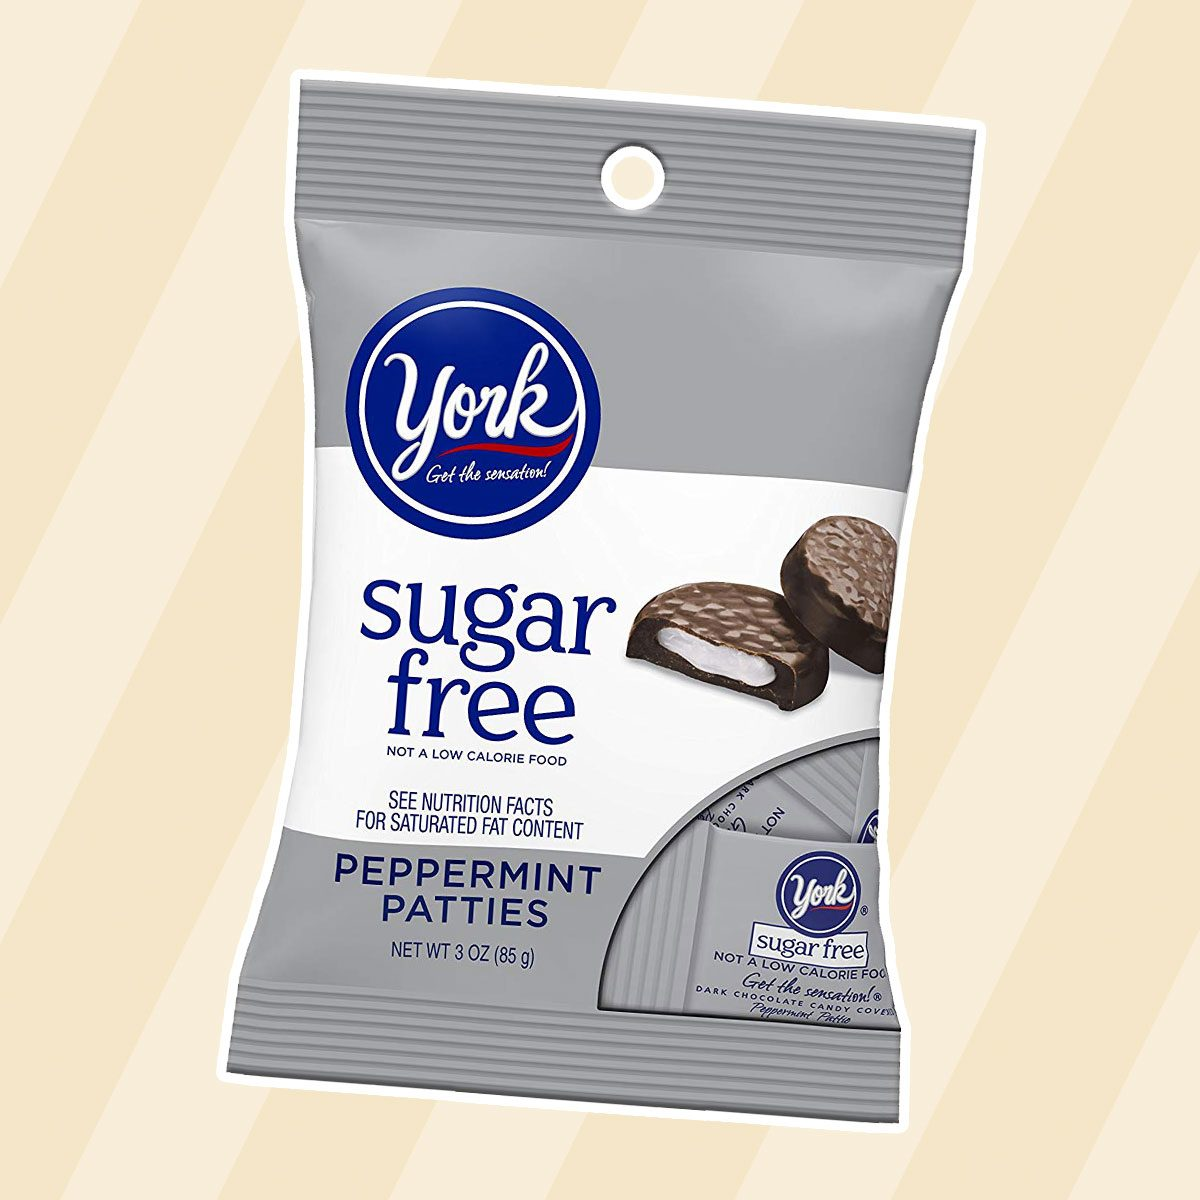 YORK Sugar-Free Peppermint Patties